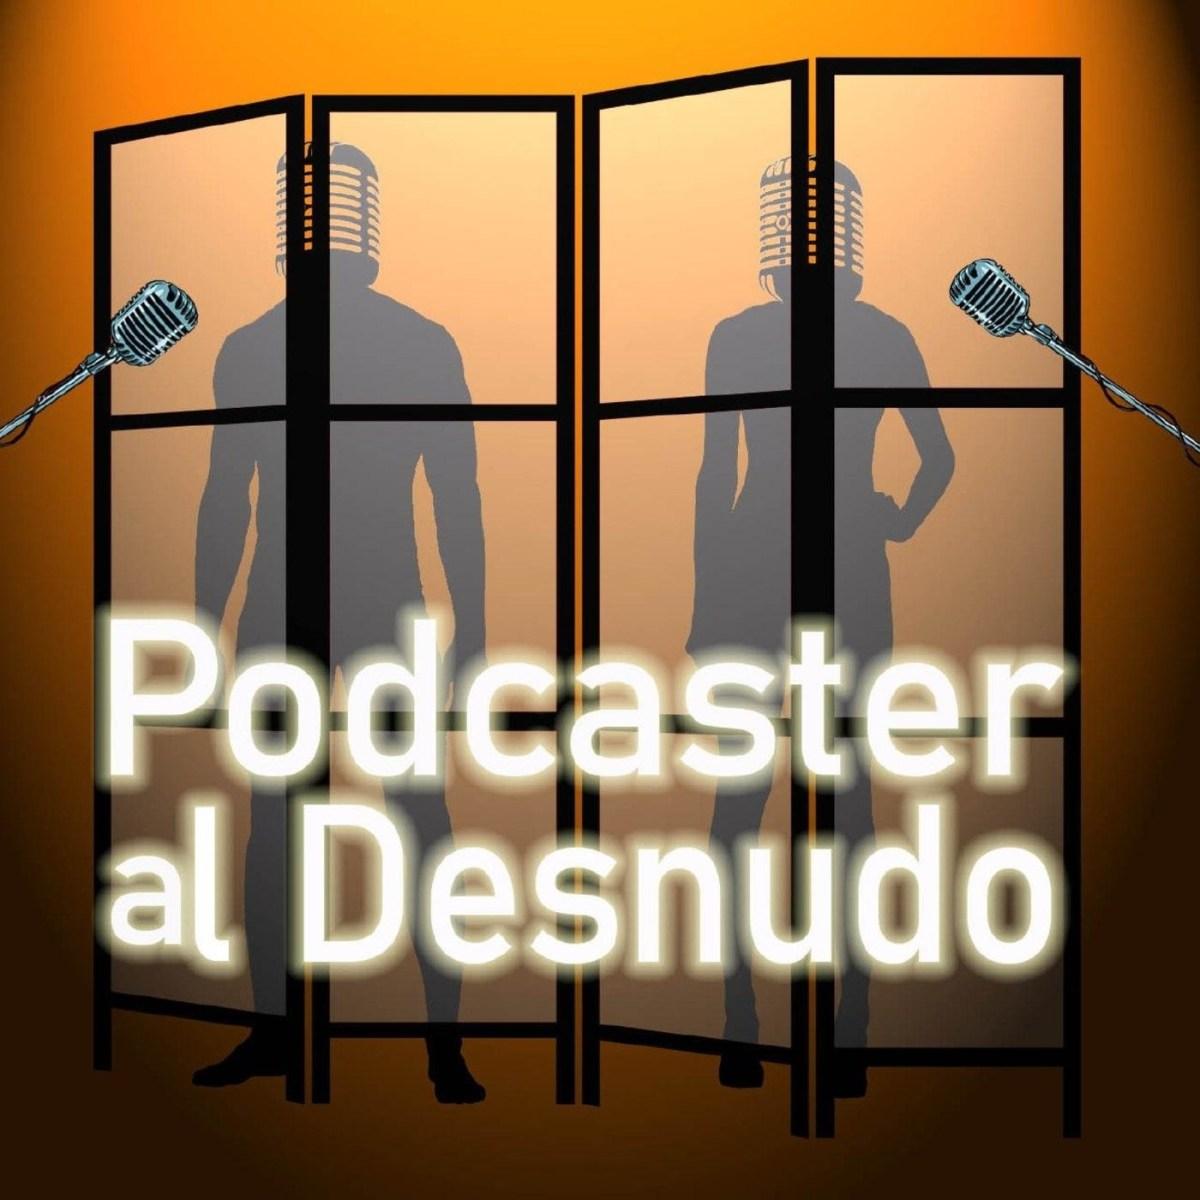 Podcaster al Desnudo